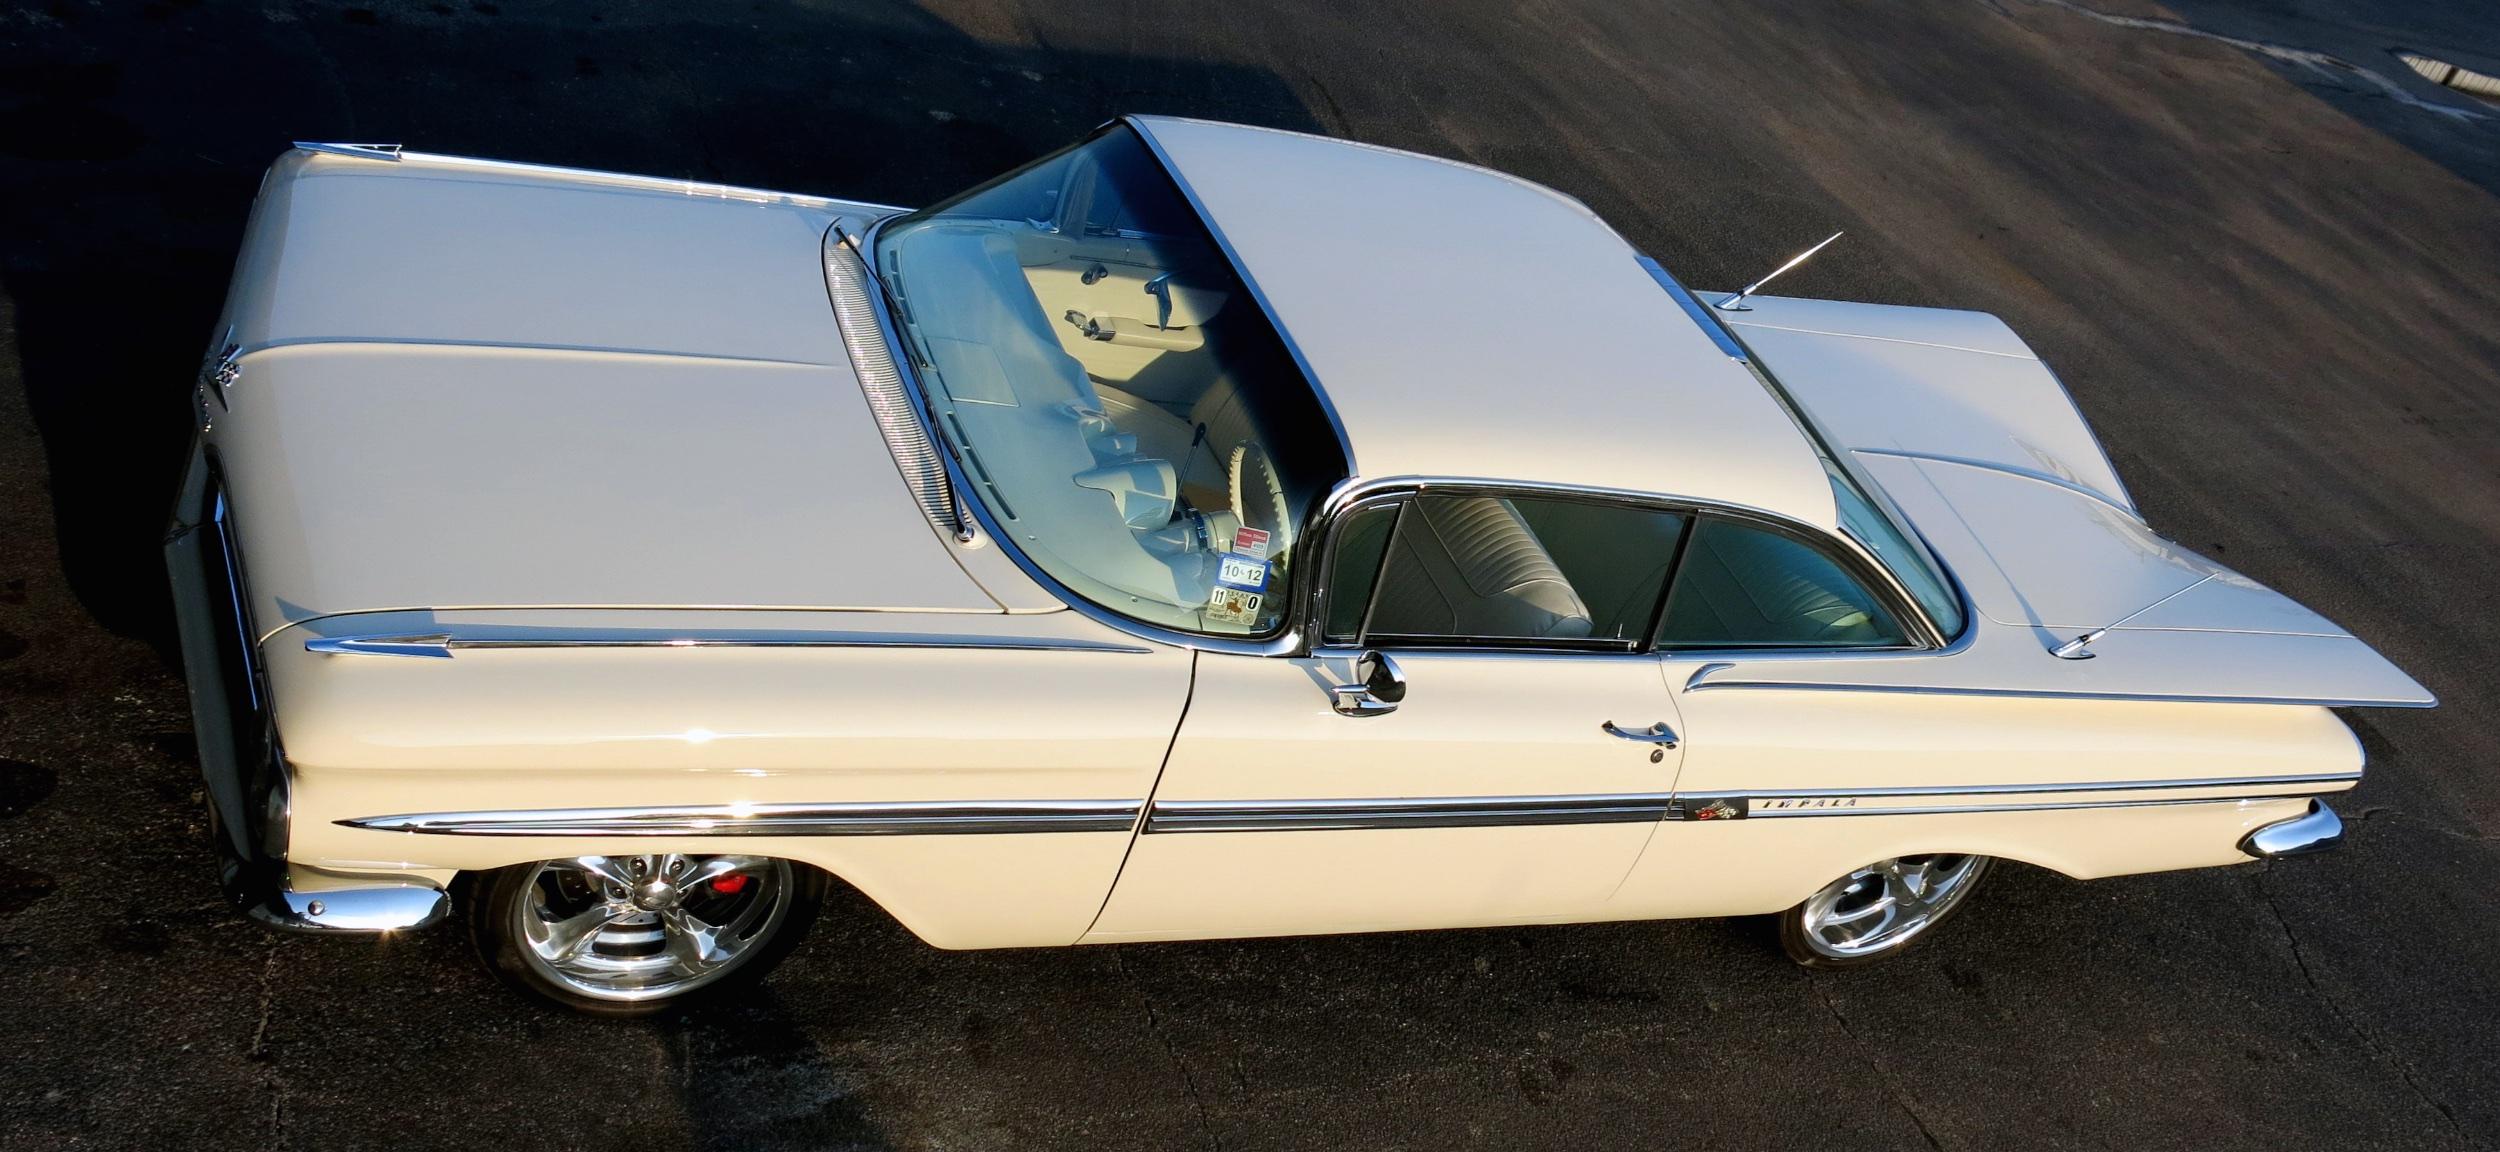 014_59_Impala_side.jpg